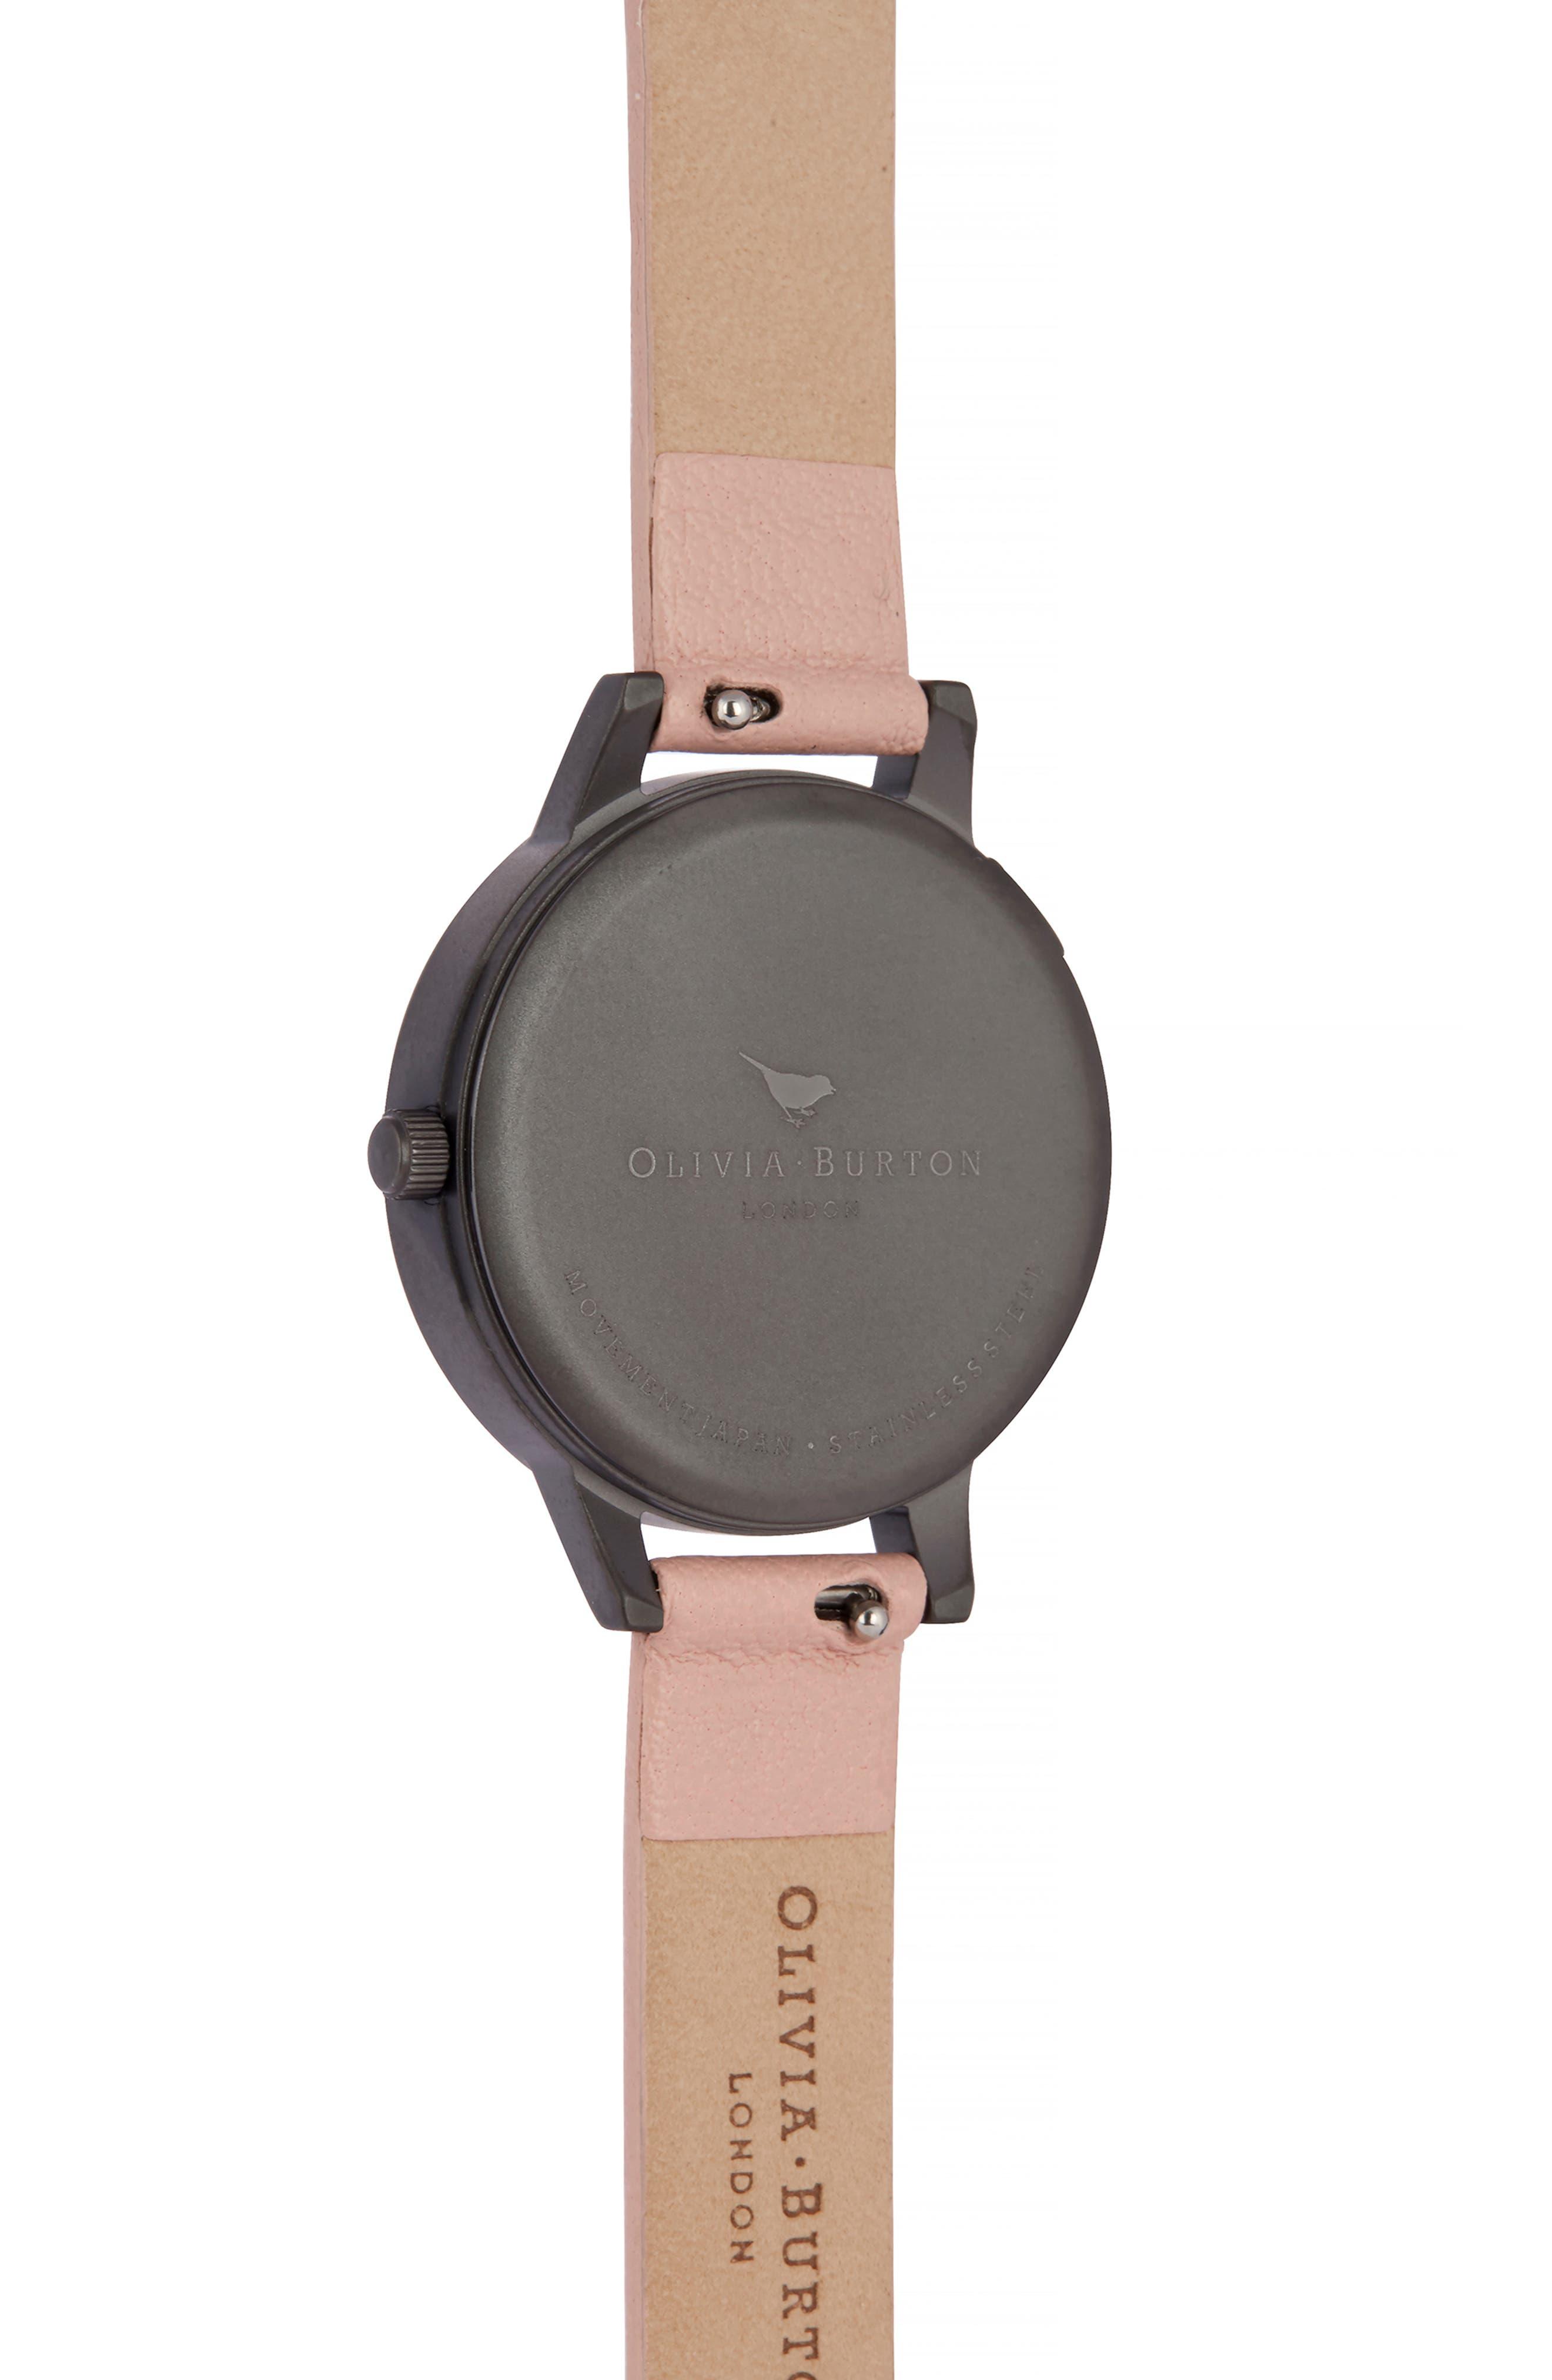 OLIVIA BURTON, Twilight Leather Strap Watch, 30mm, Alternate thumbnail 3, color, 650